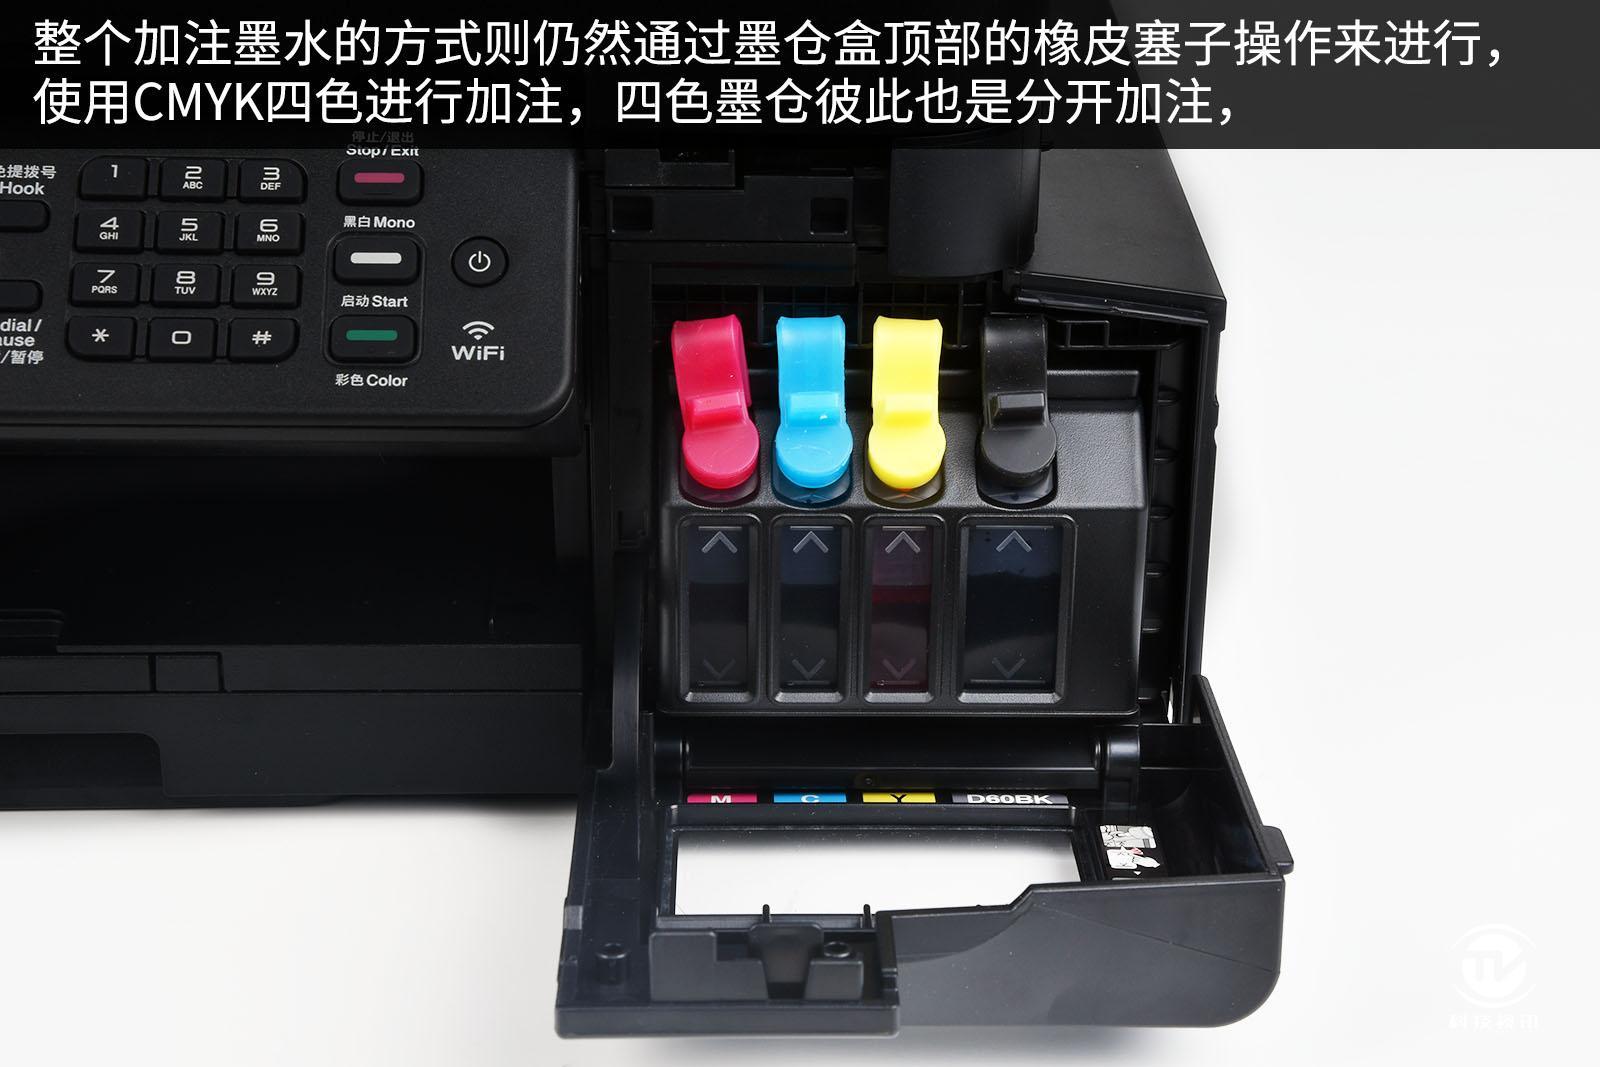 4DSC_7408.jpg